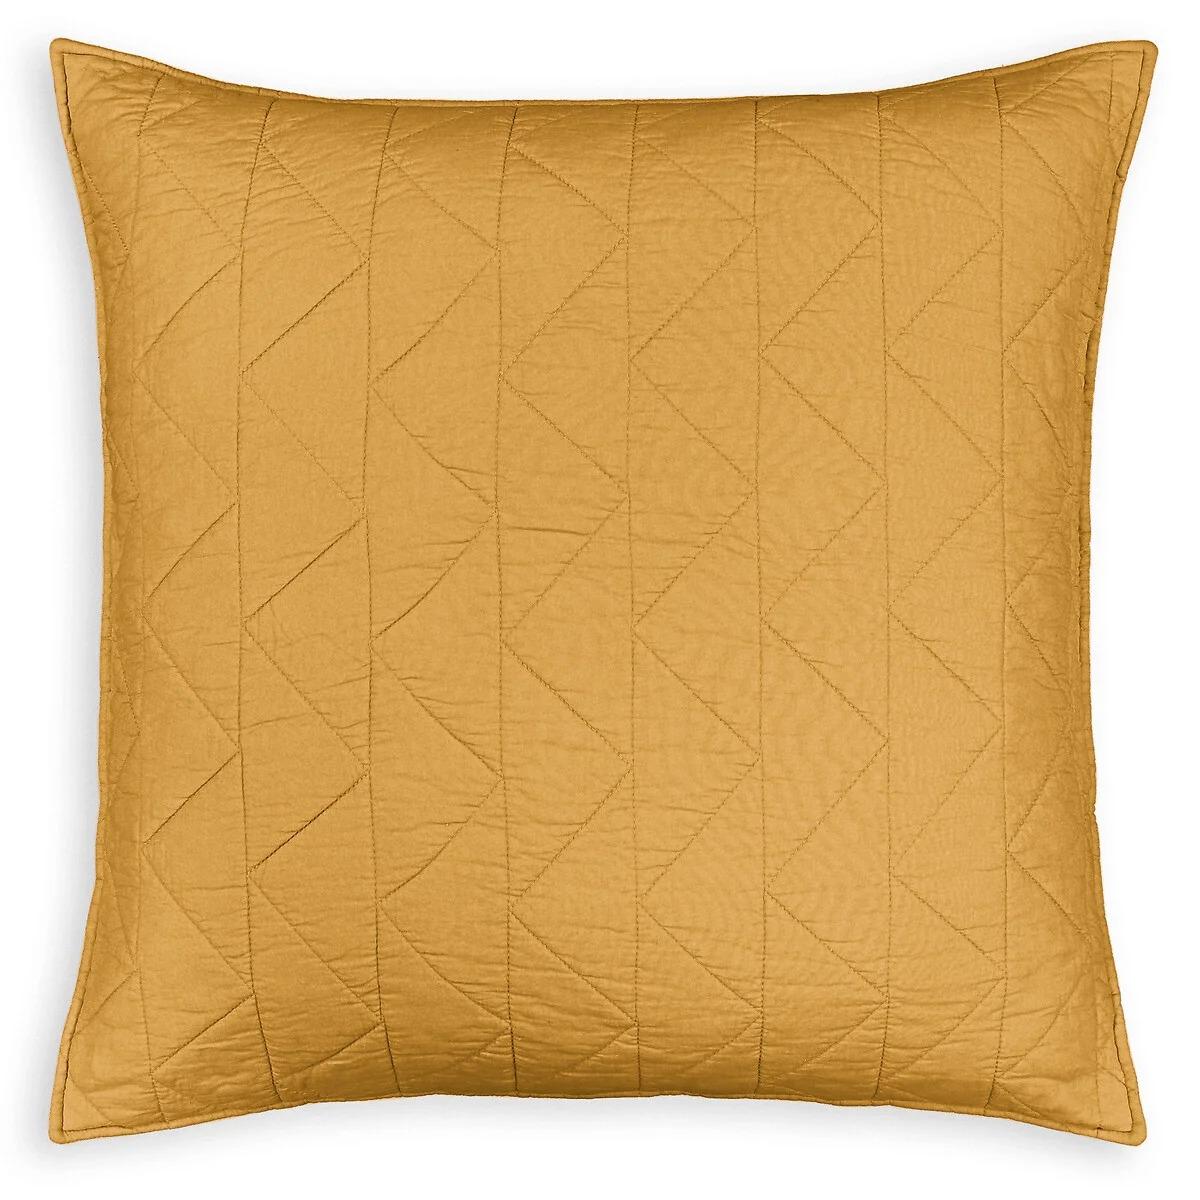 ZIG ZAG SCENARIO ジグザグキルティング クッションカバー/枕カバー